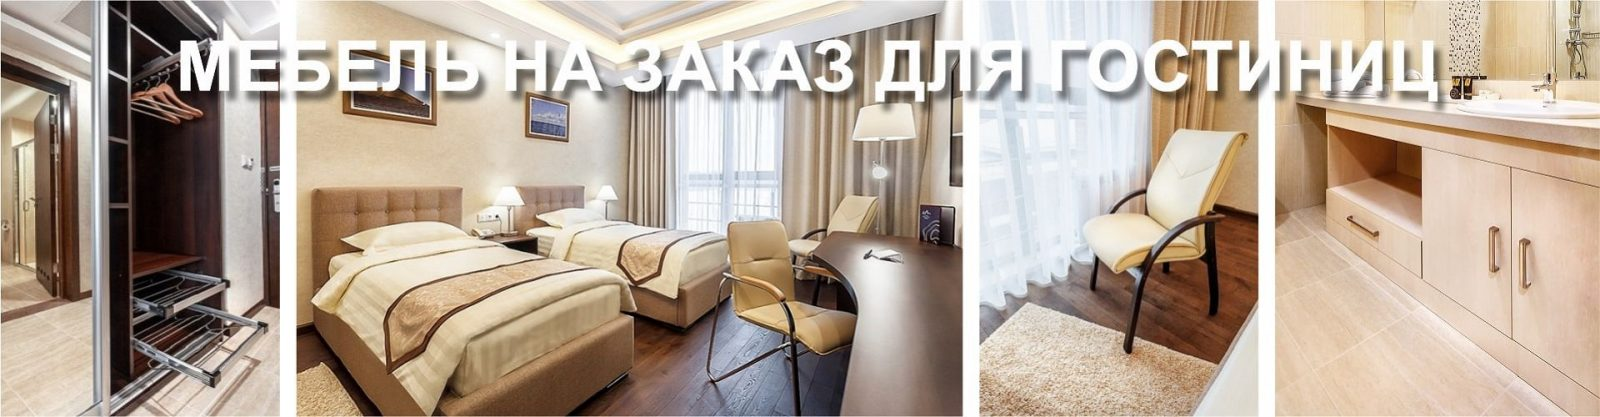 Мебель для гостиниц на заказ производство БЕЛС баннер